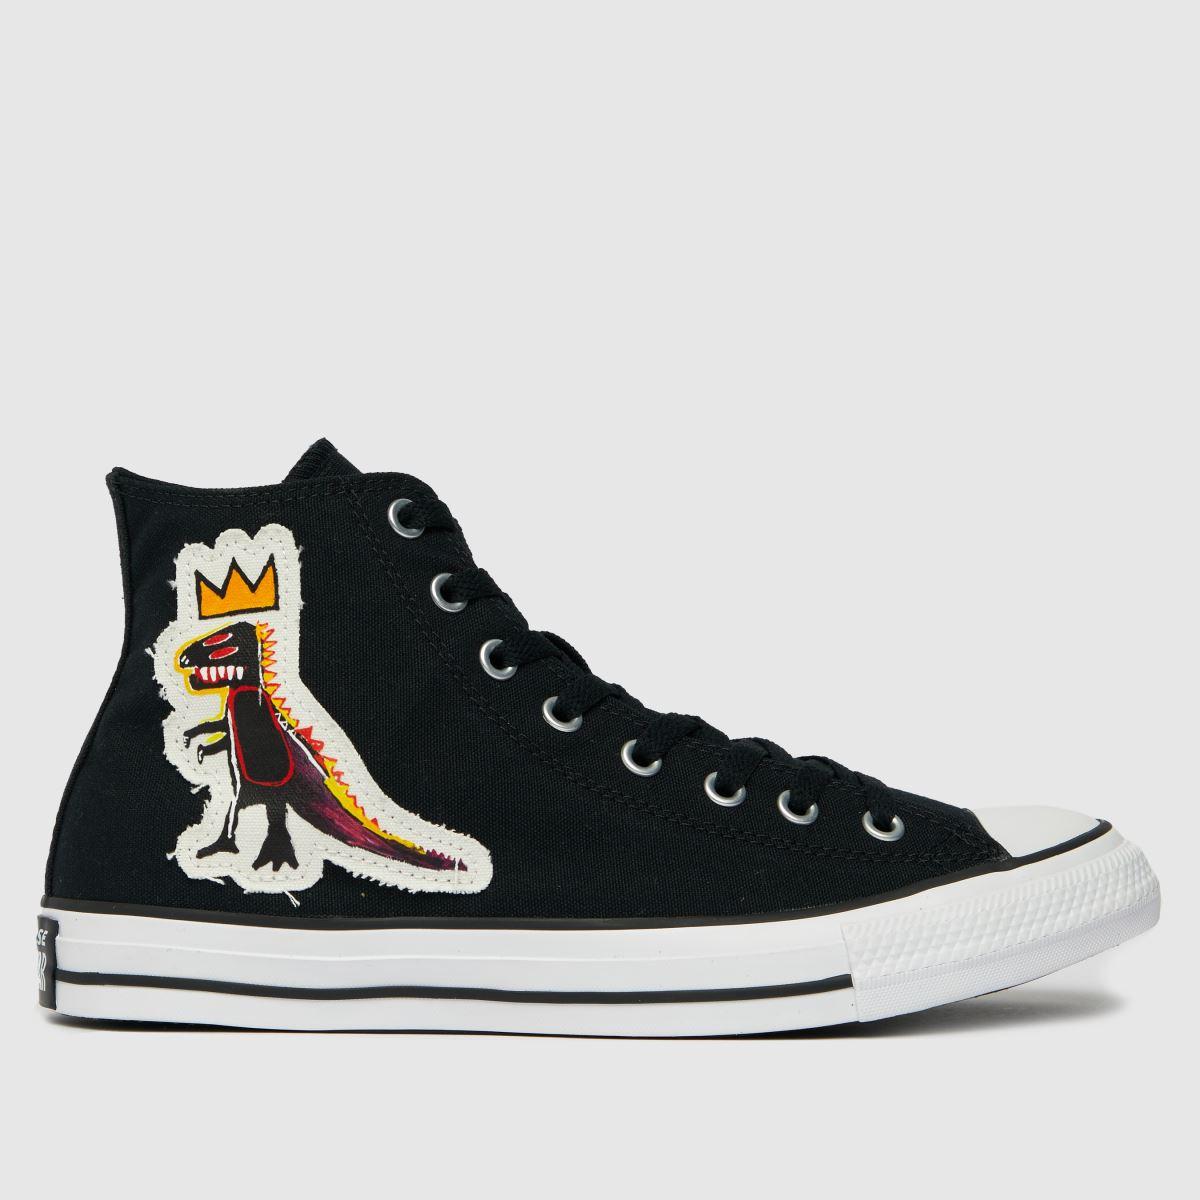 Converse Black & White Basquiat Hi Trainers